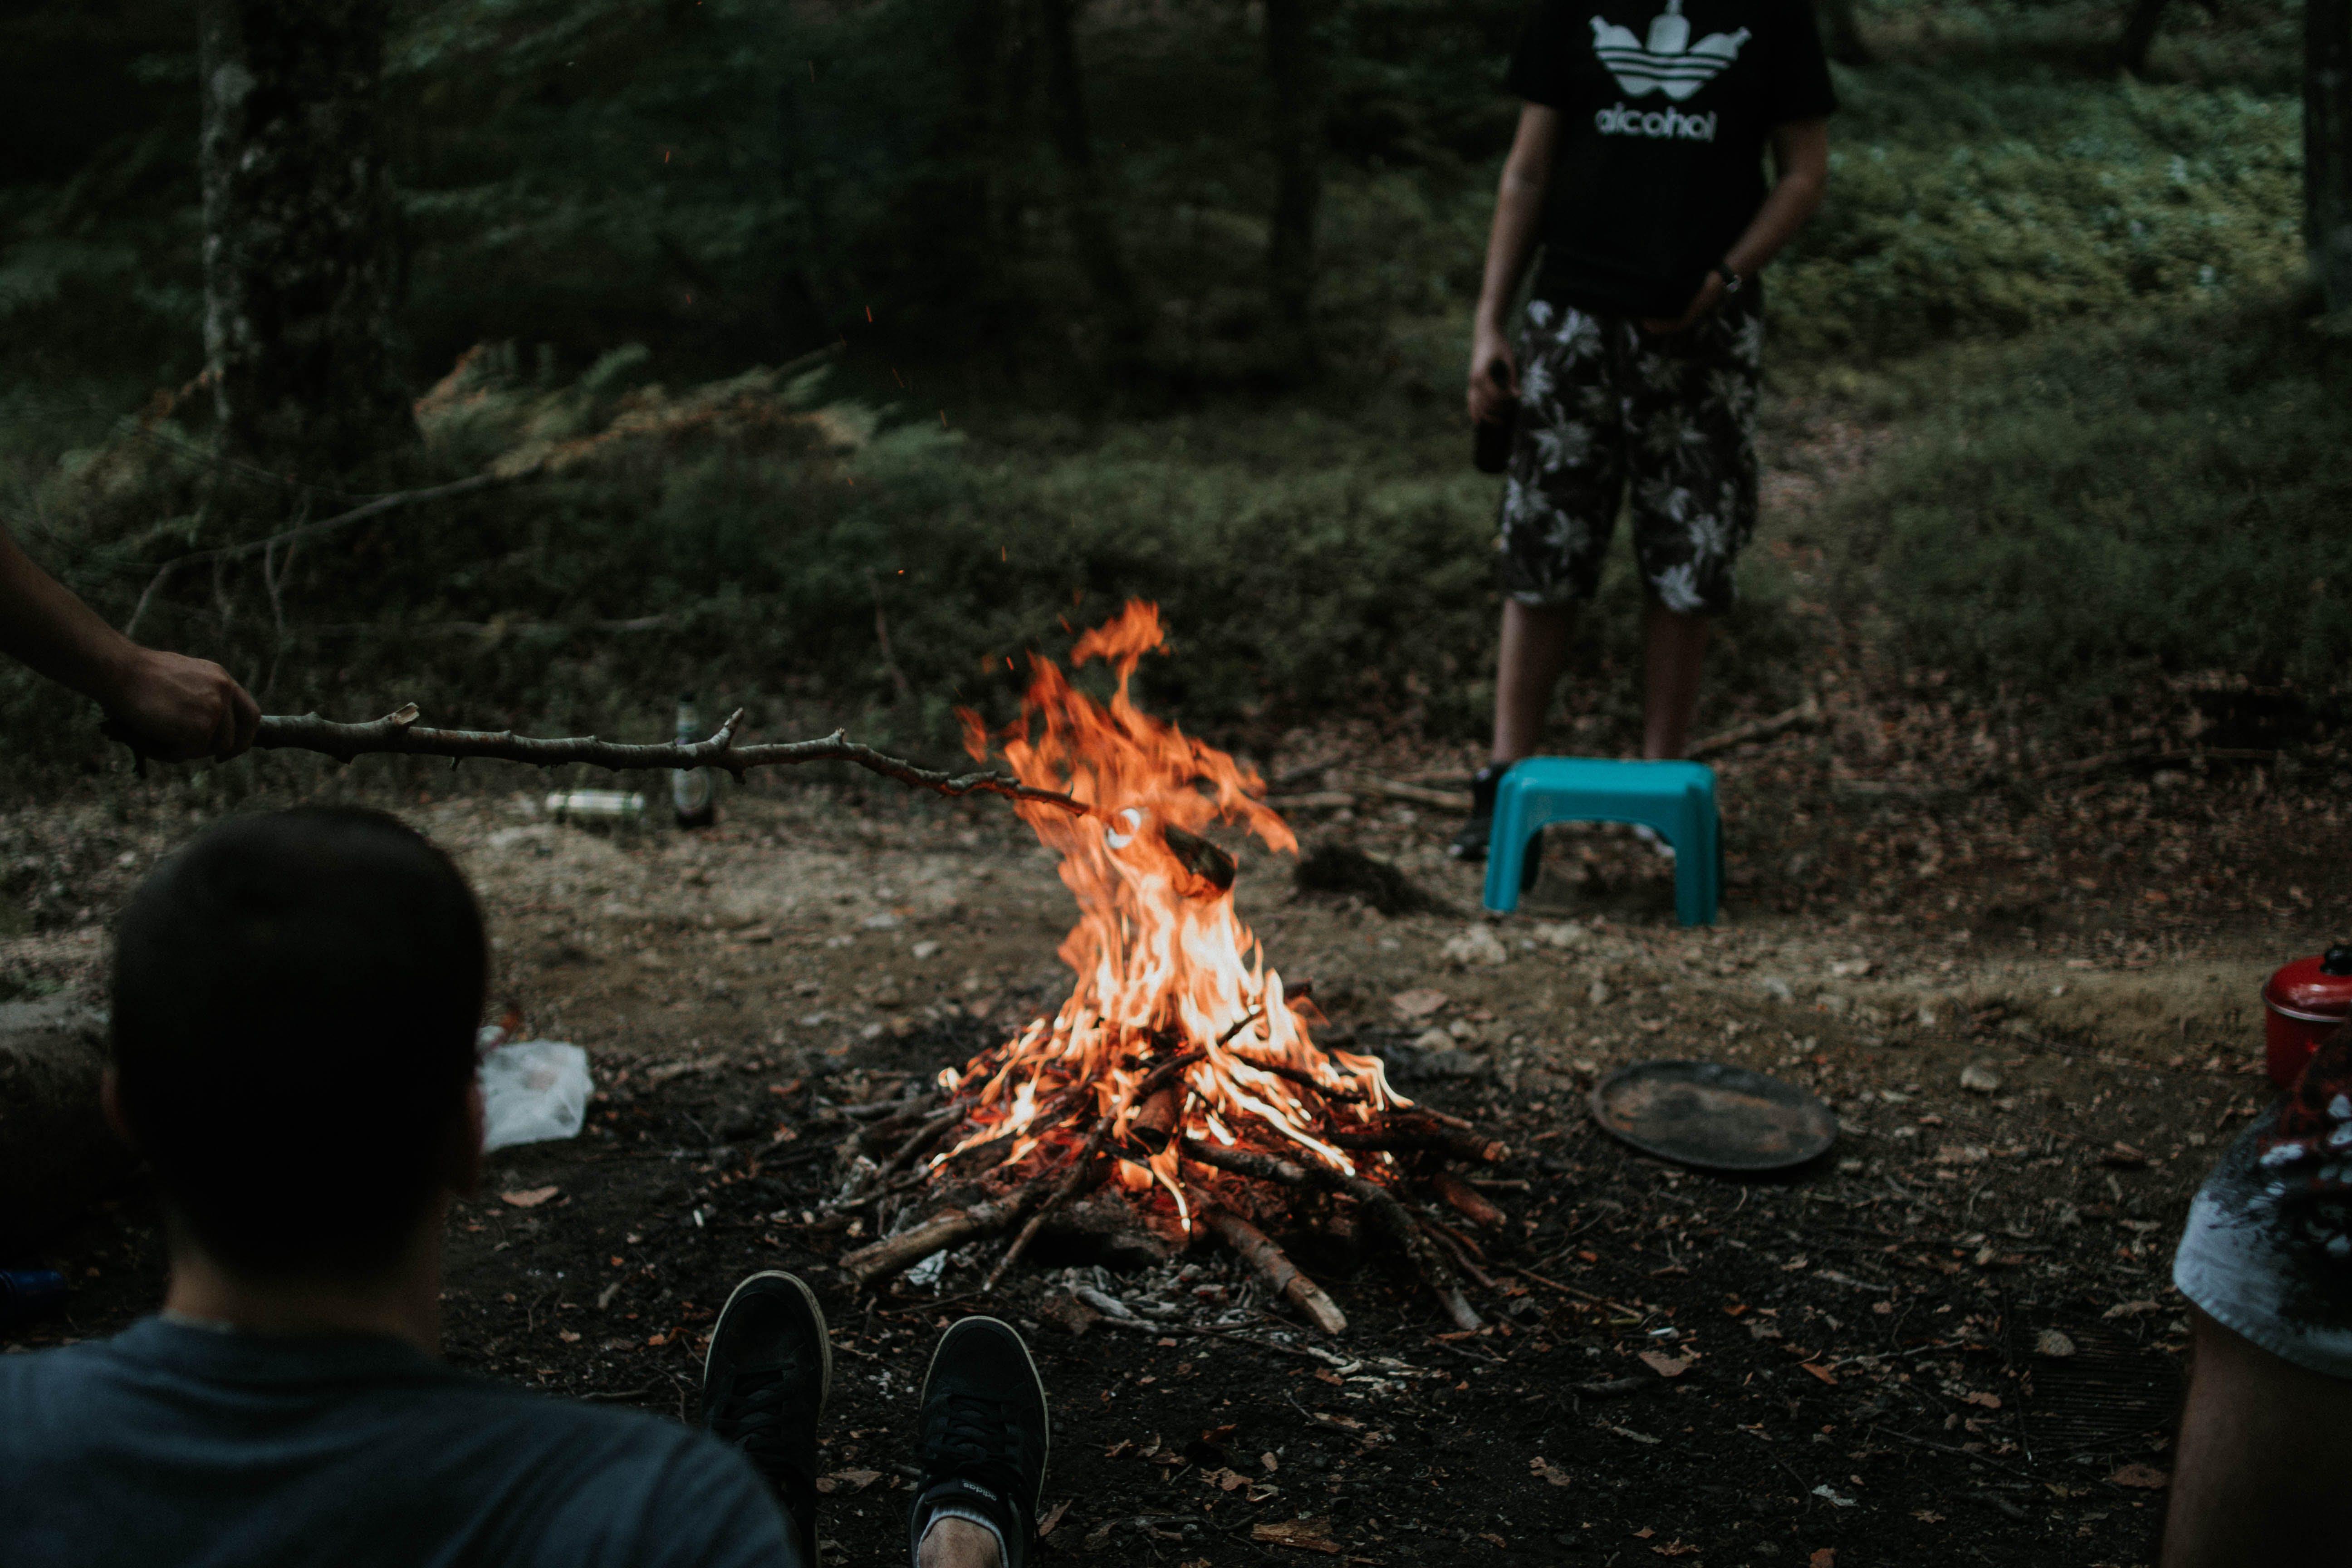 Man Sitting Near Bonfire